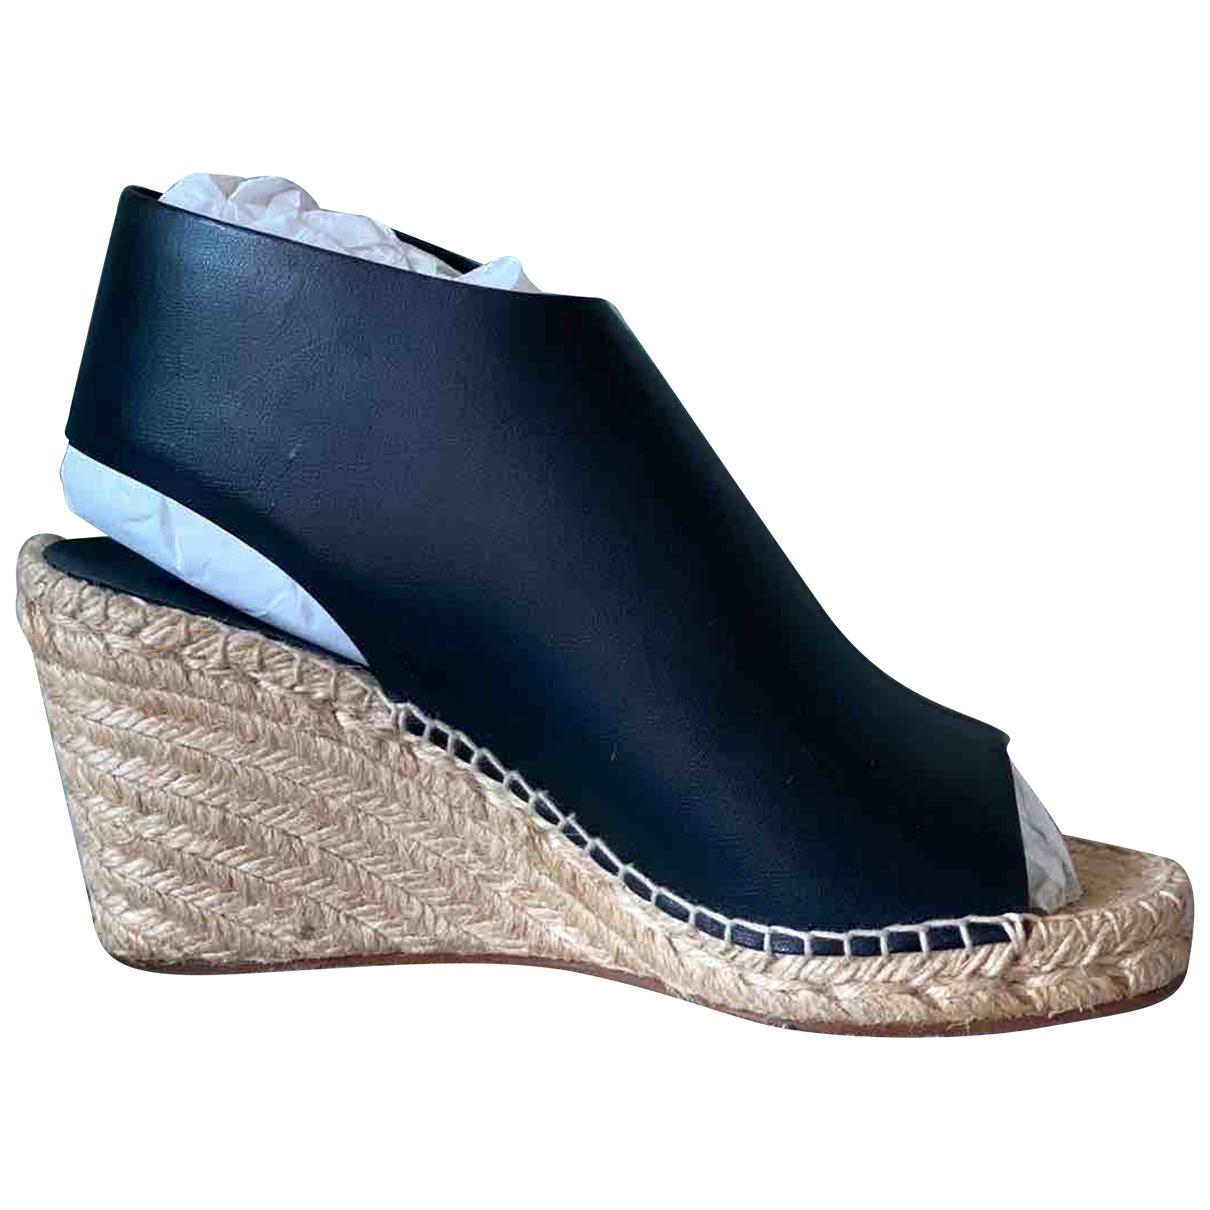 Celine \N Black Leather Sandals for Women 36 EU